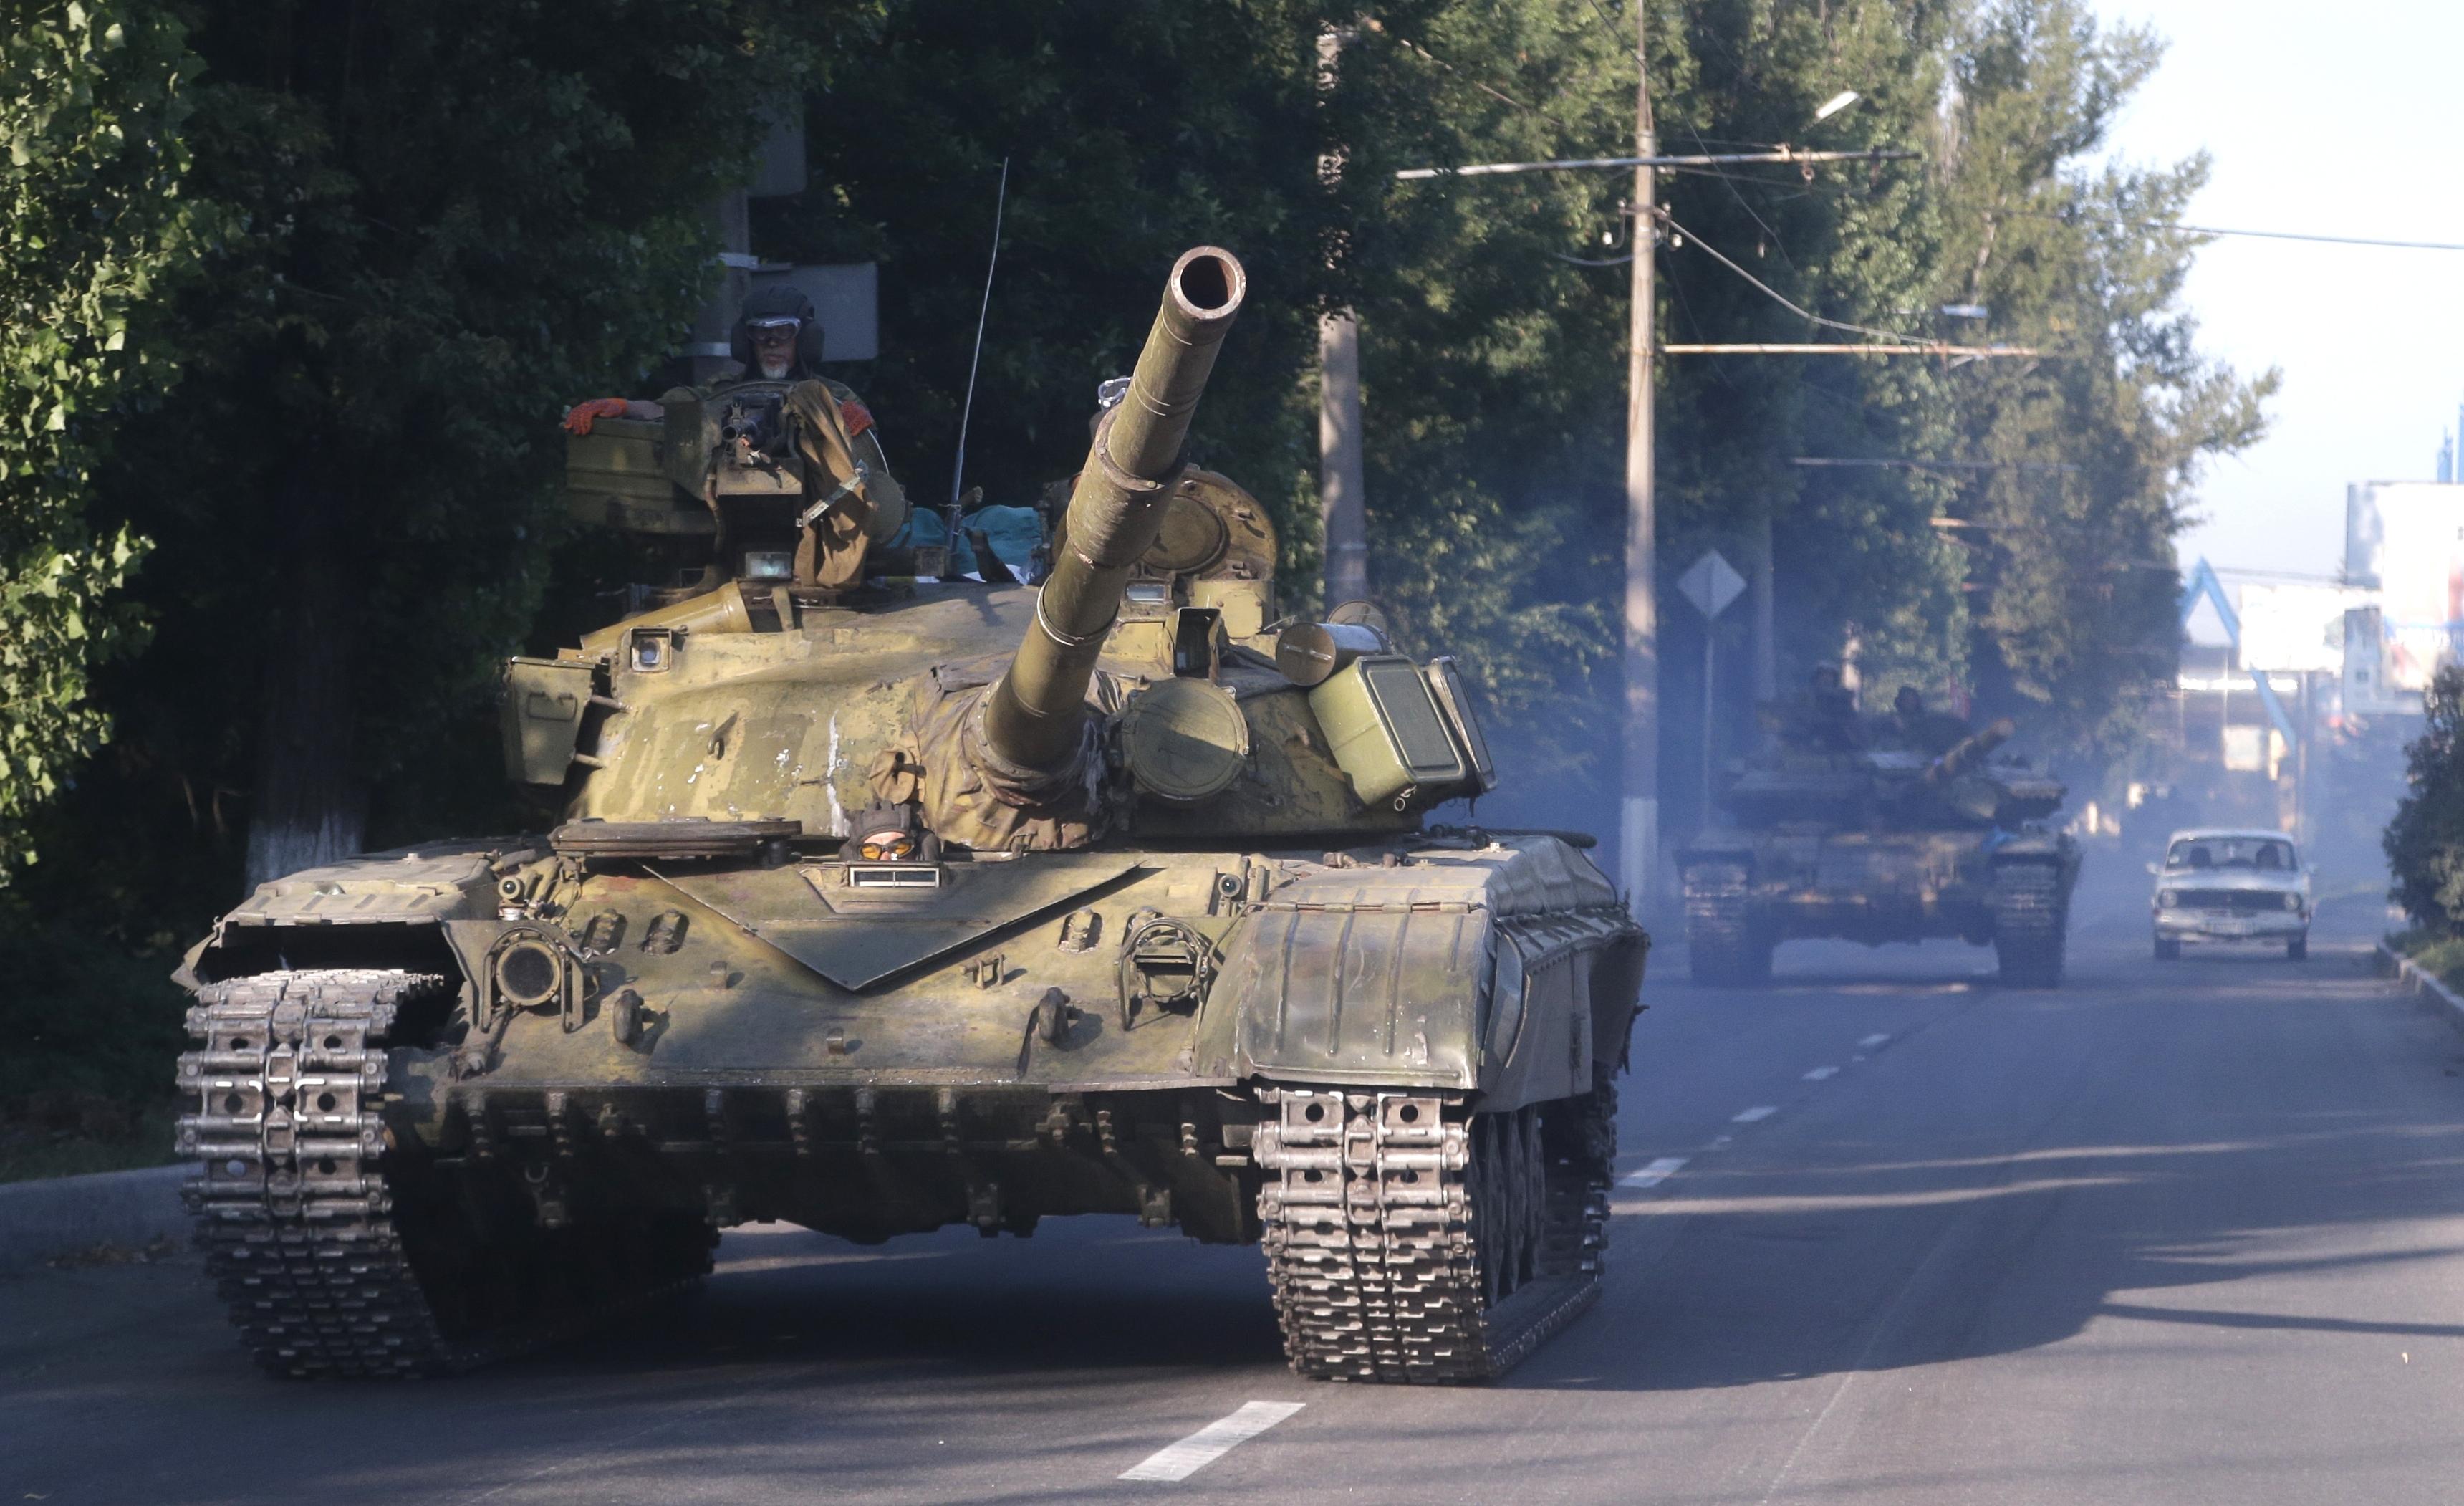 Ukraine Russian Tanks Have Crossed The Border